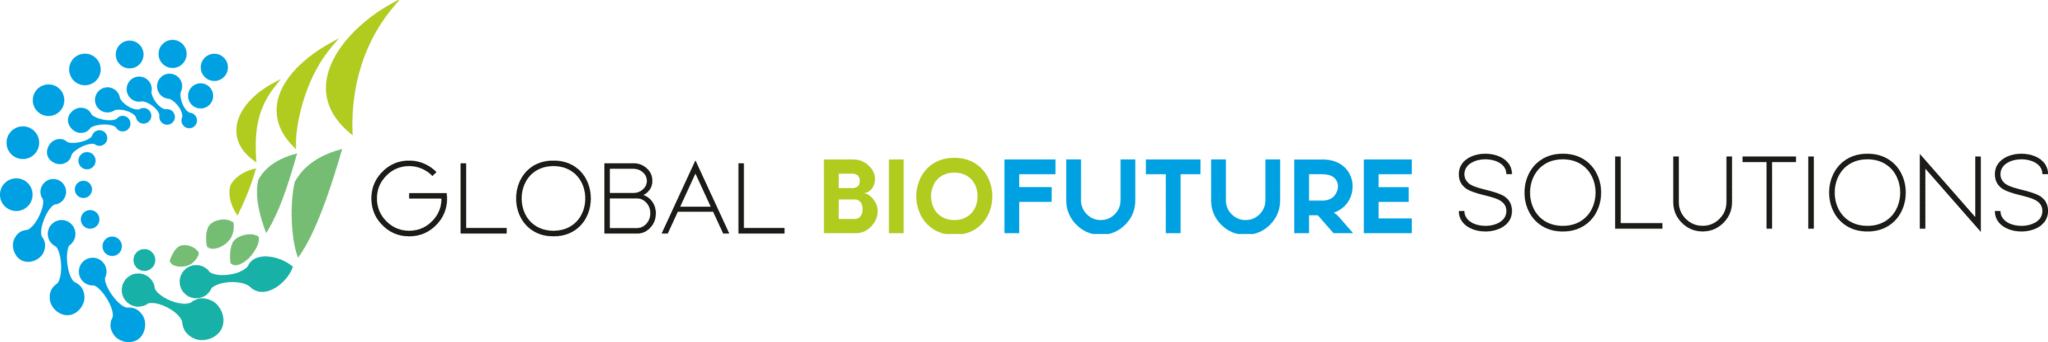 Global BioFuture Solutions, Inc.